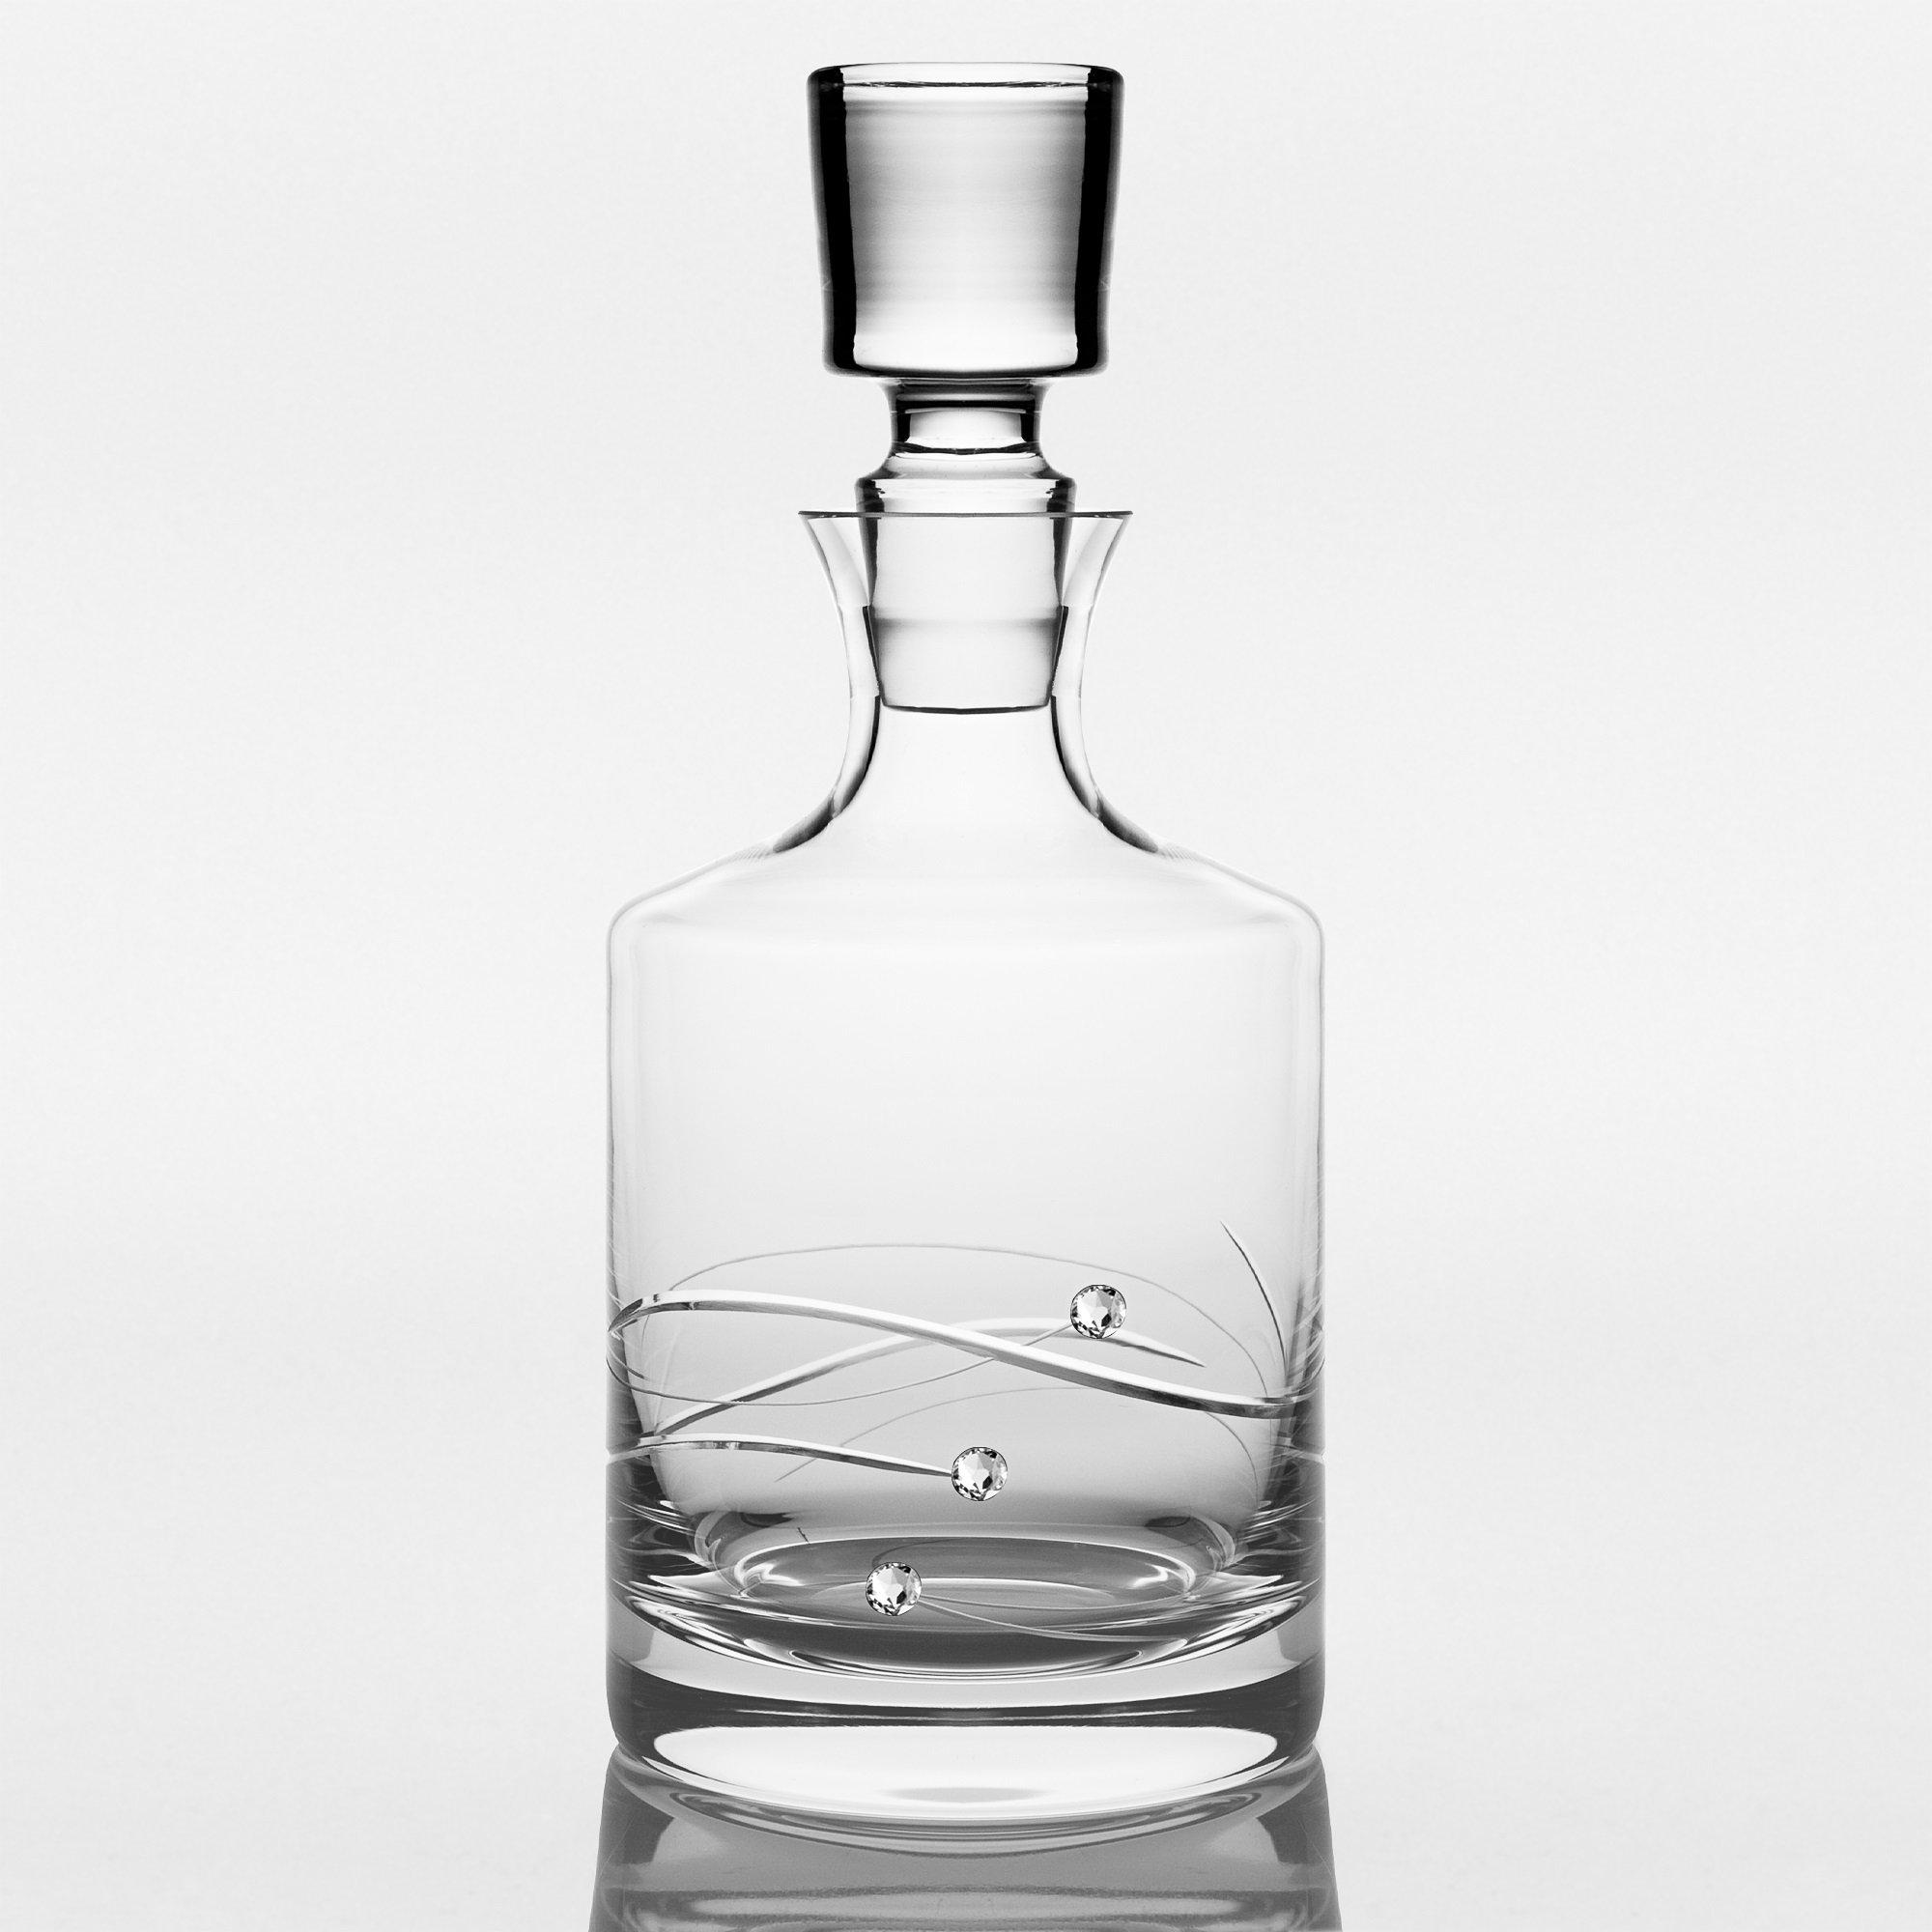 Barski - Handmade Glass - Sparkle - Whiskey Decanter - Decorated with Real Swarovski Diamonds - Gift Boxed - 26 oz .- Made in Europe by BARSKI (Image #2)